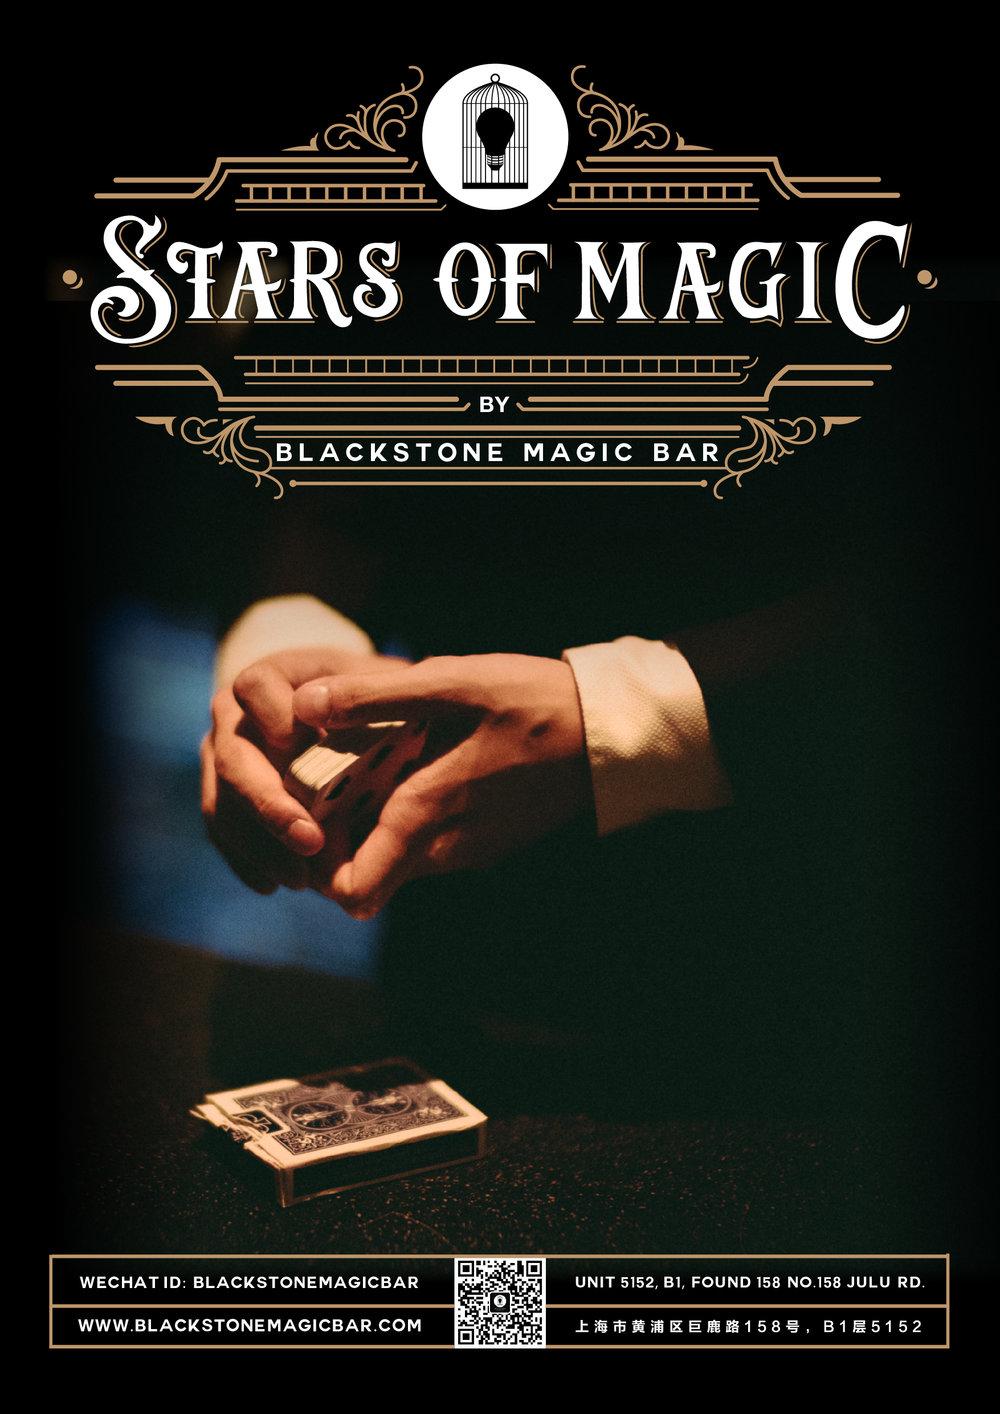 Stars of magic-无姓名0104-01.jpg